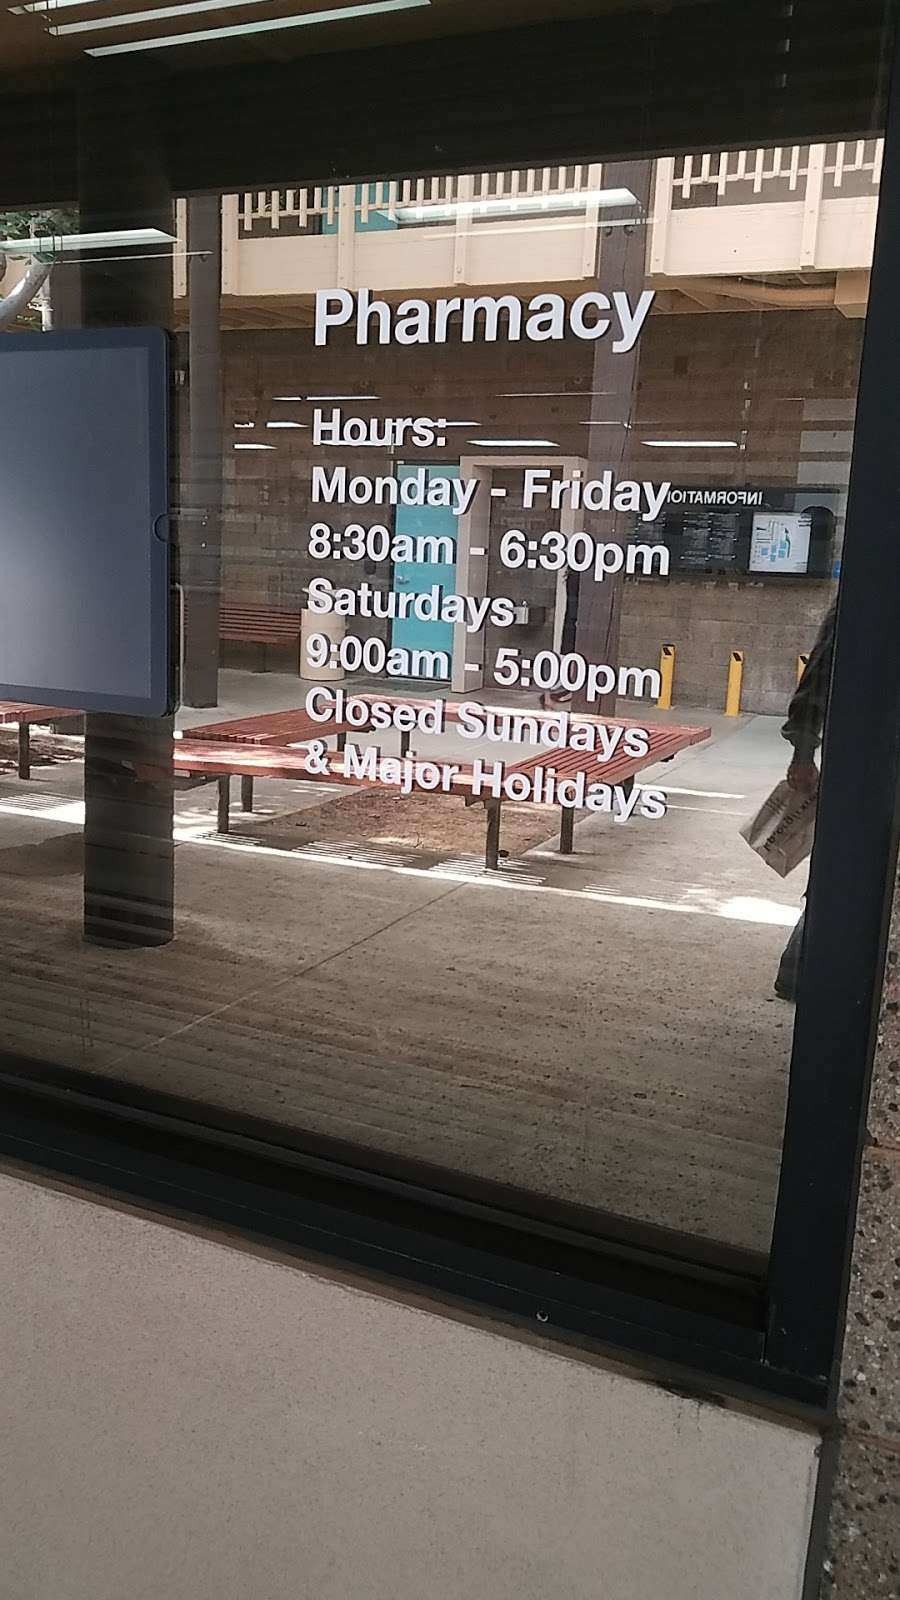 Kaiser Permanente Medical Offices - hospital  | Photo 3 of 10 | Address: 3955 Bonita Rd, Bonita, CA 91902, USA | Phone: (833) 574-2273